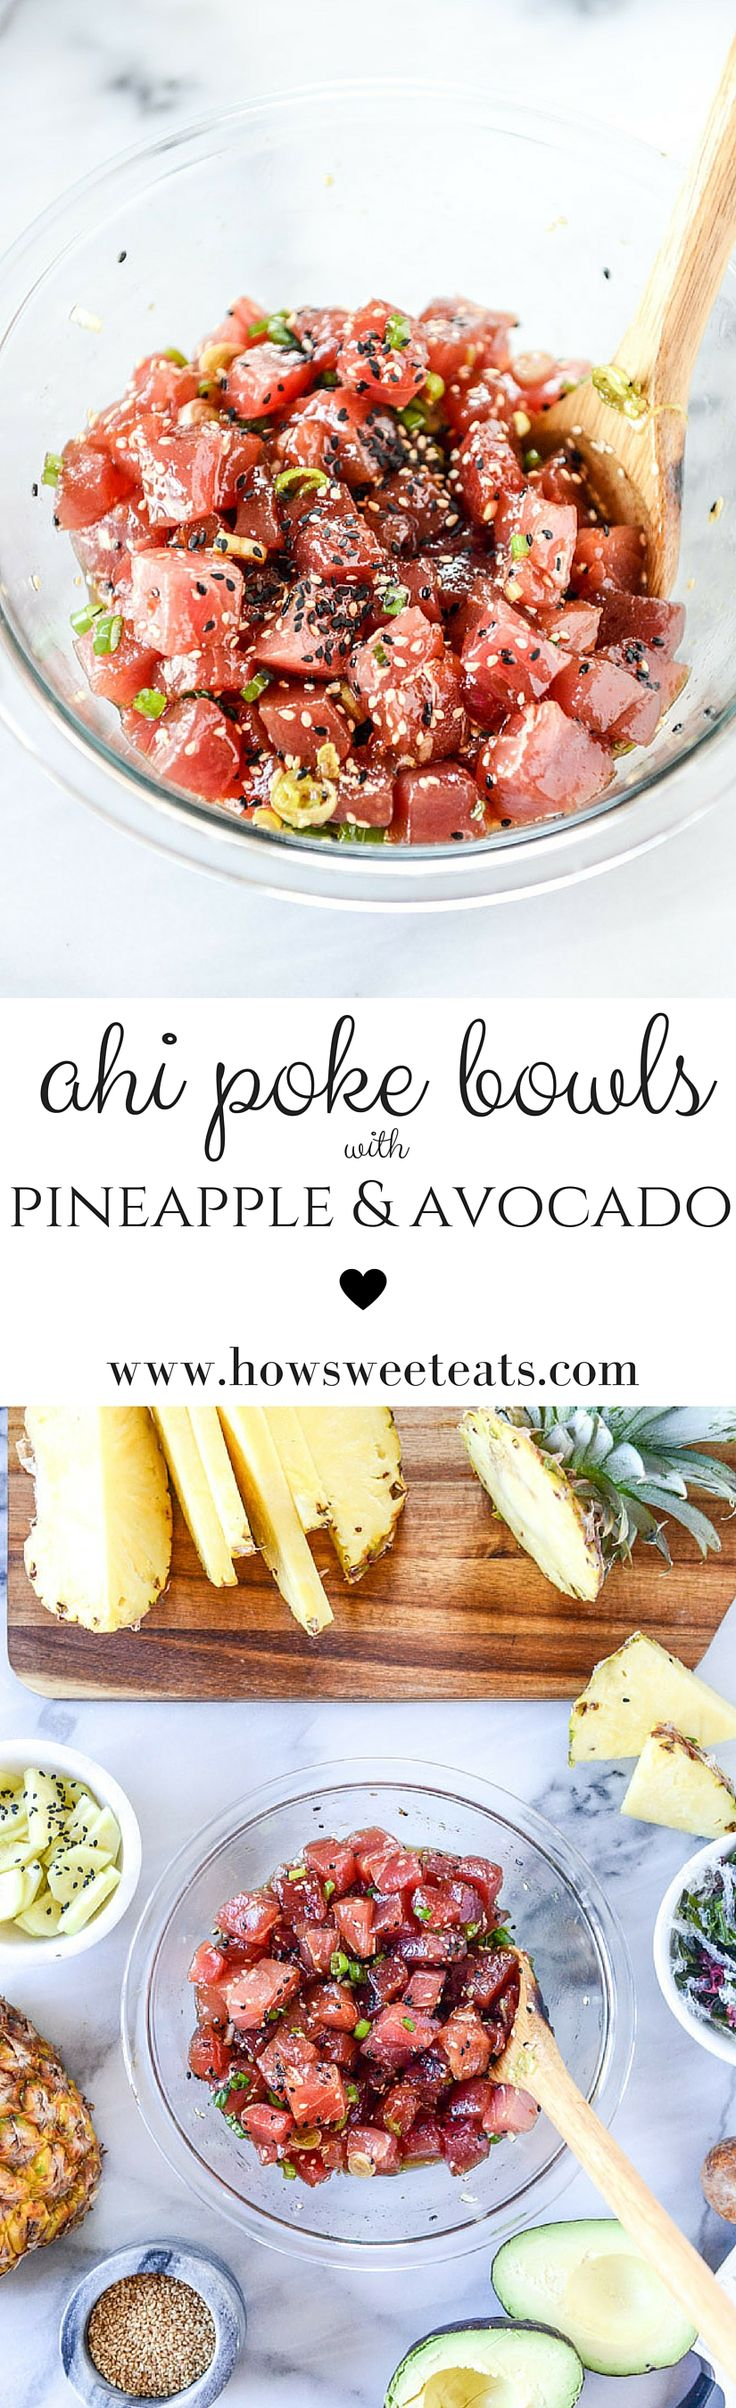 ahi poke bowls with pineapple and avocado by @howsweeteats I howsweeteats.com